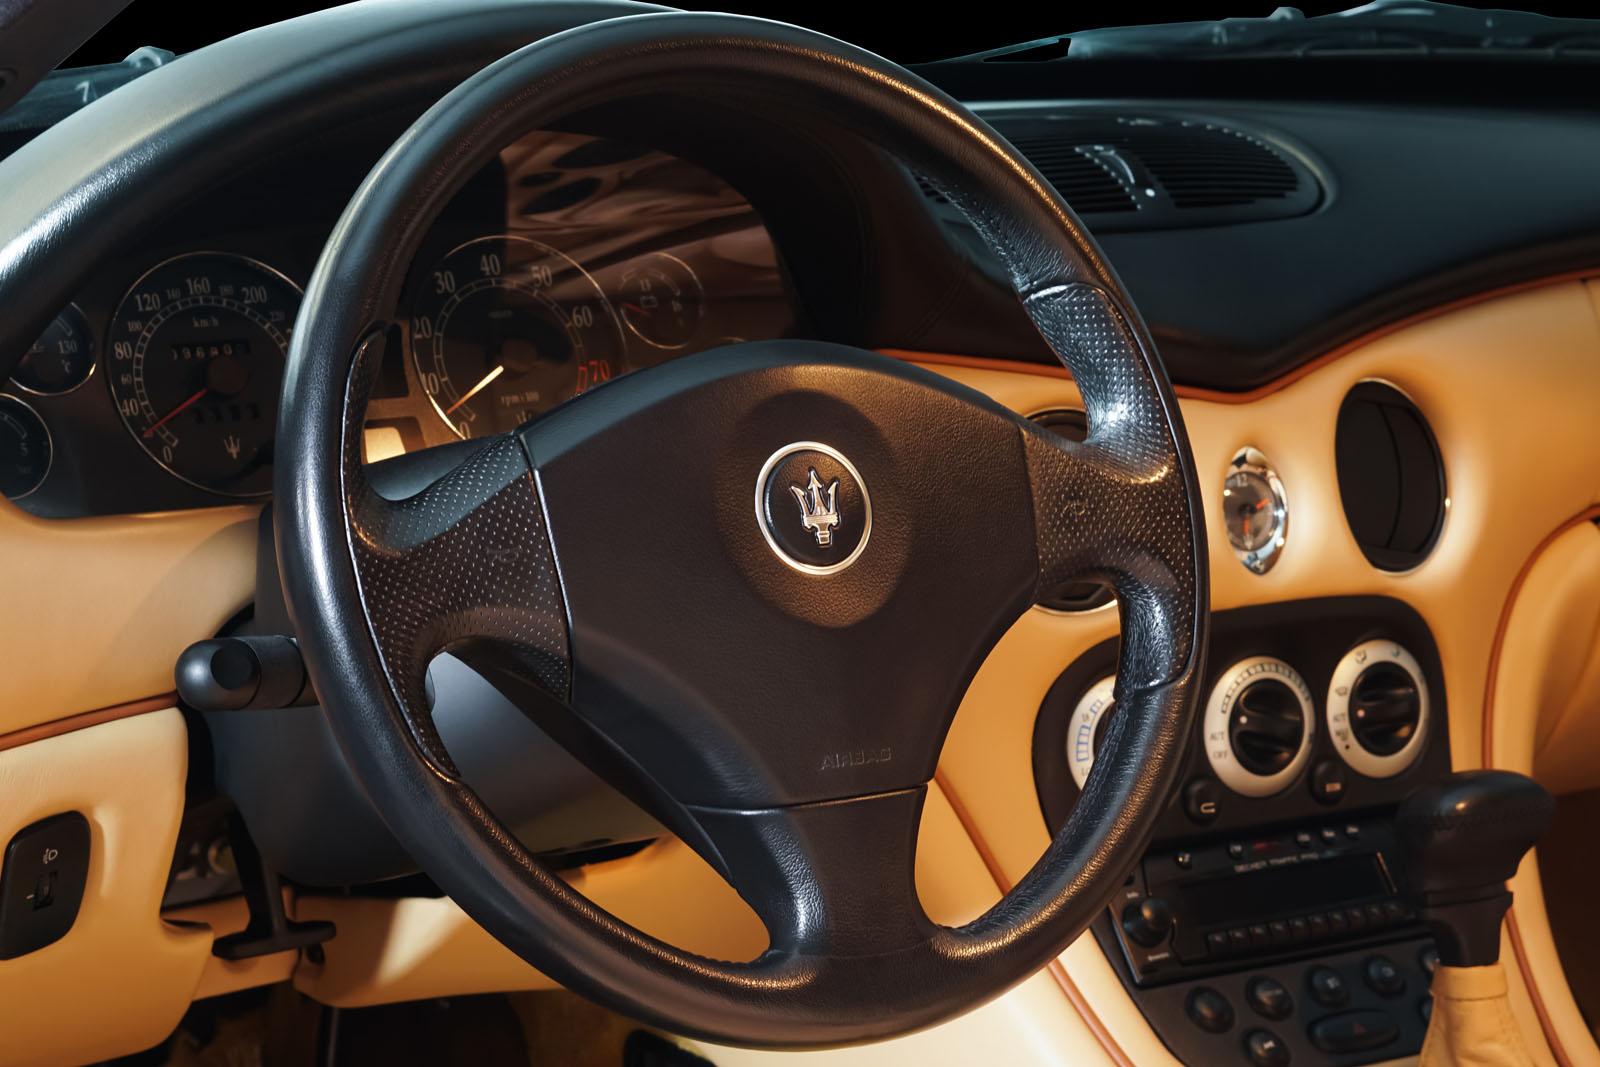 Maserati_3200_GTA_Grau_Beige_MAS-0874_10_w